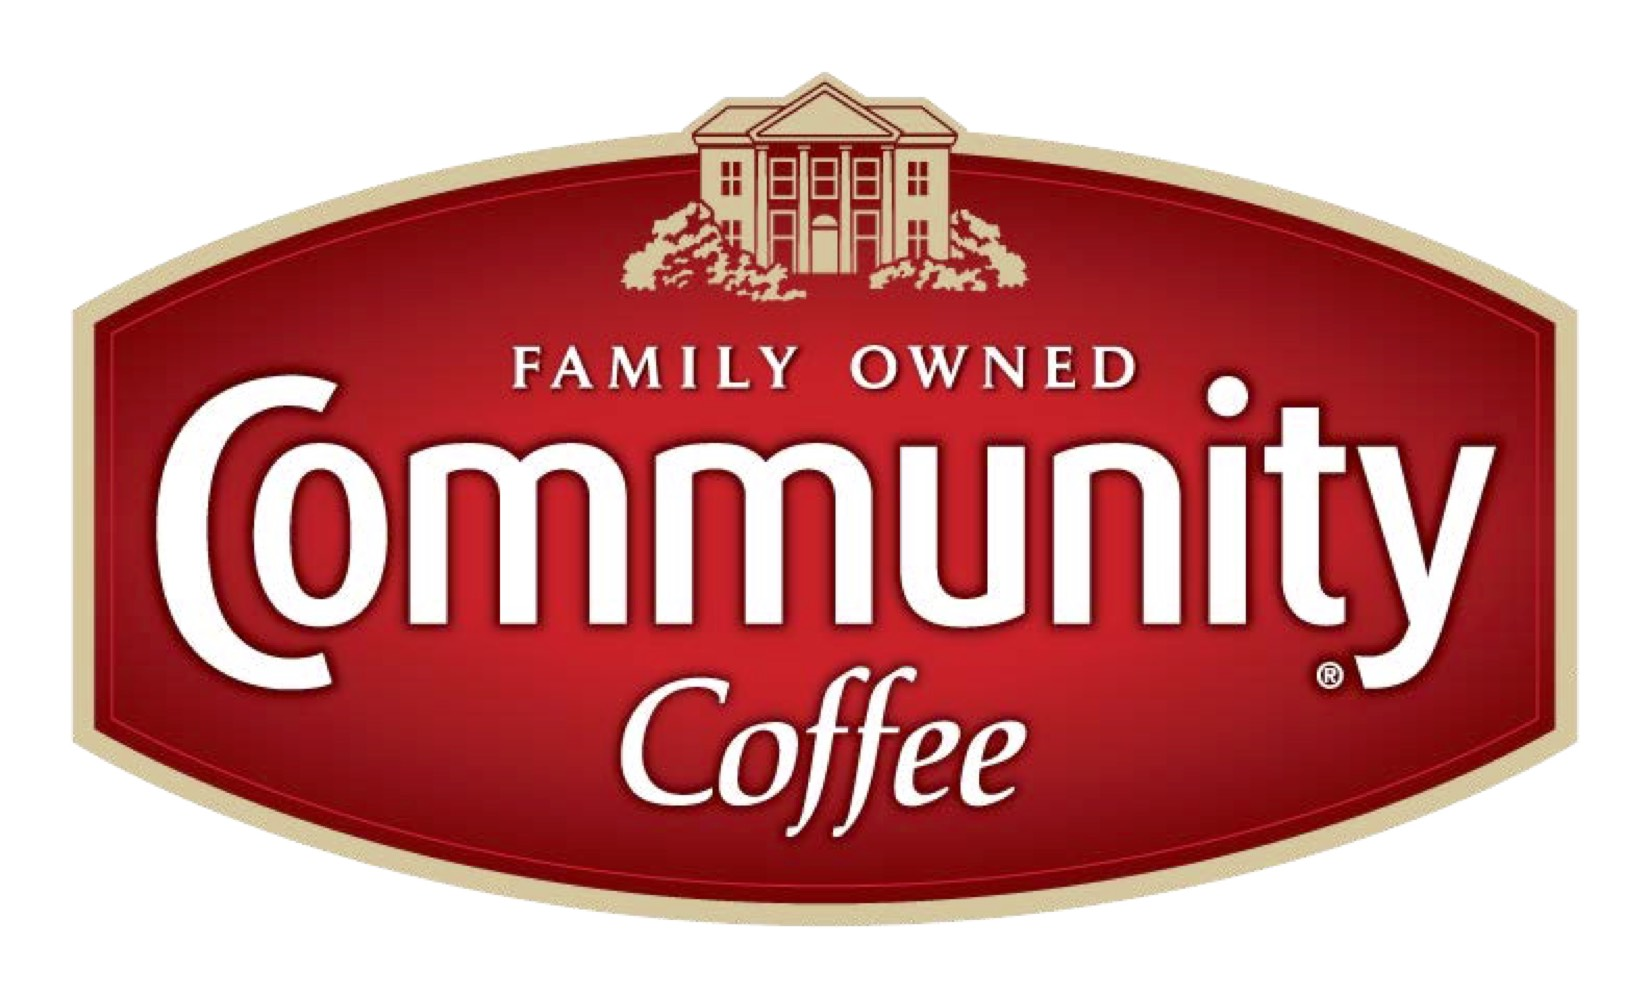 ComCof_Primary.pdf Jpeg CCC Logo.jpg